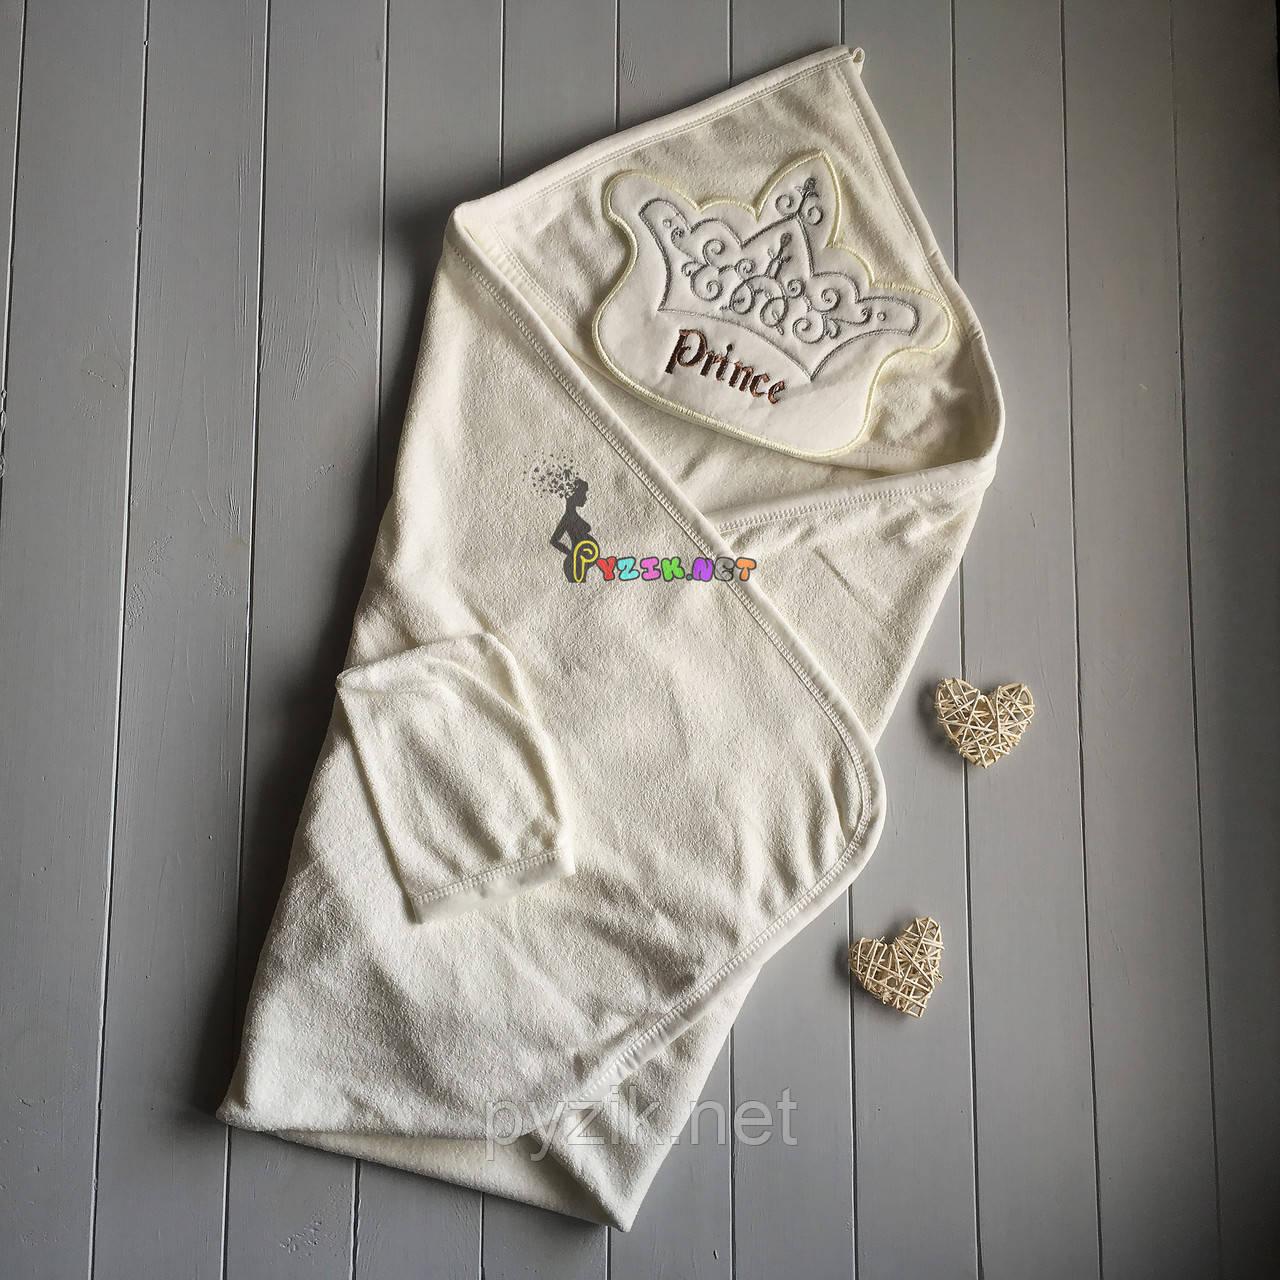 "Полотенце-уголок с капюшоном и варежкой Babyline ""Prince"""